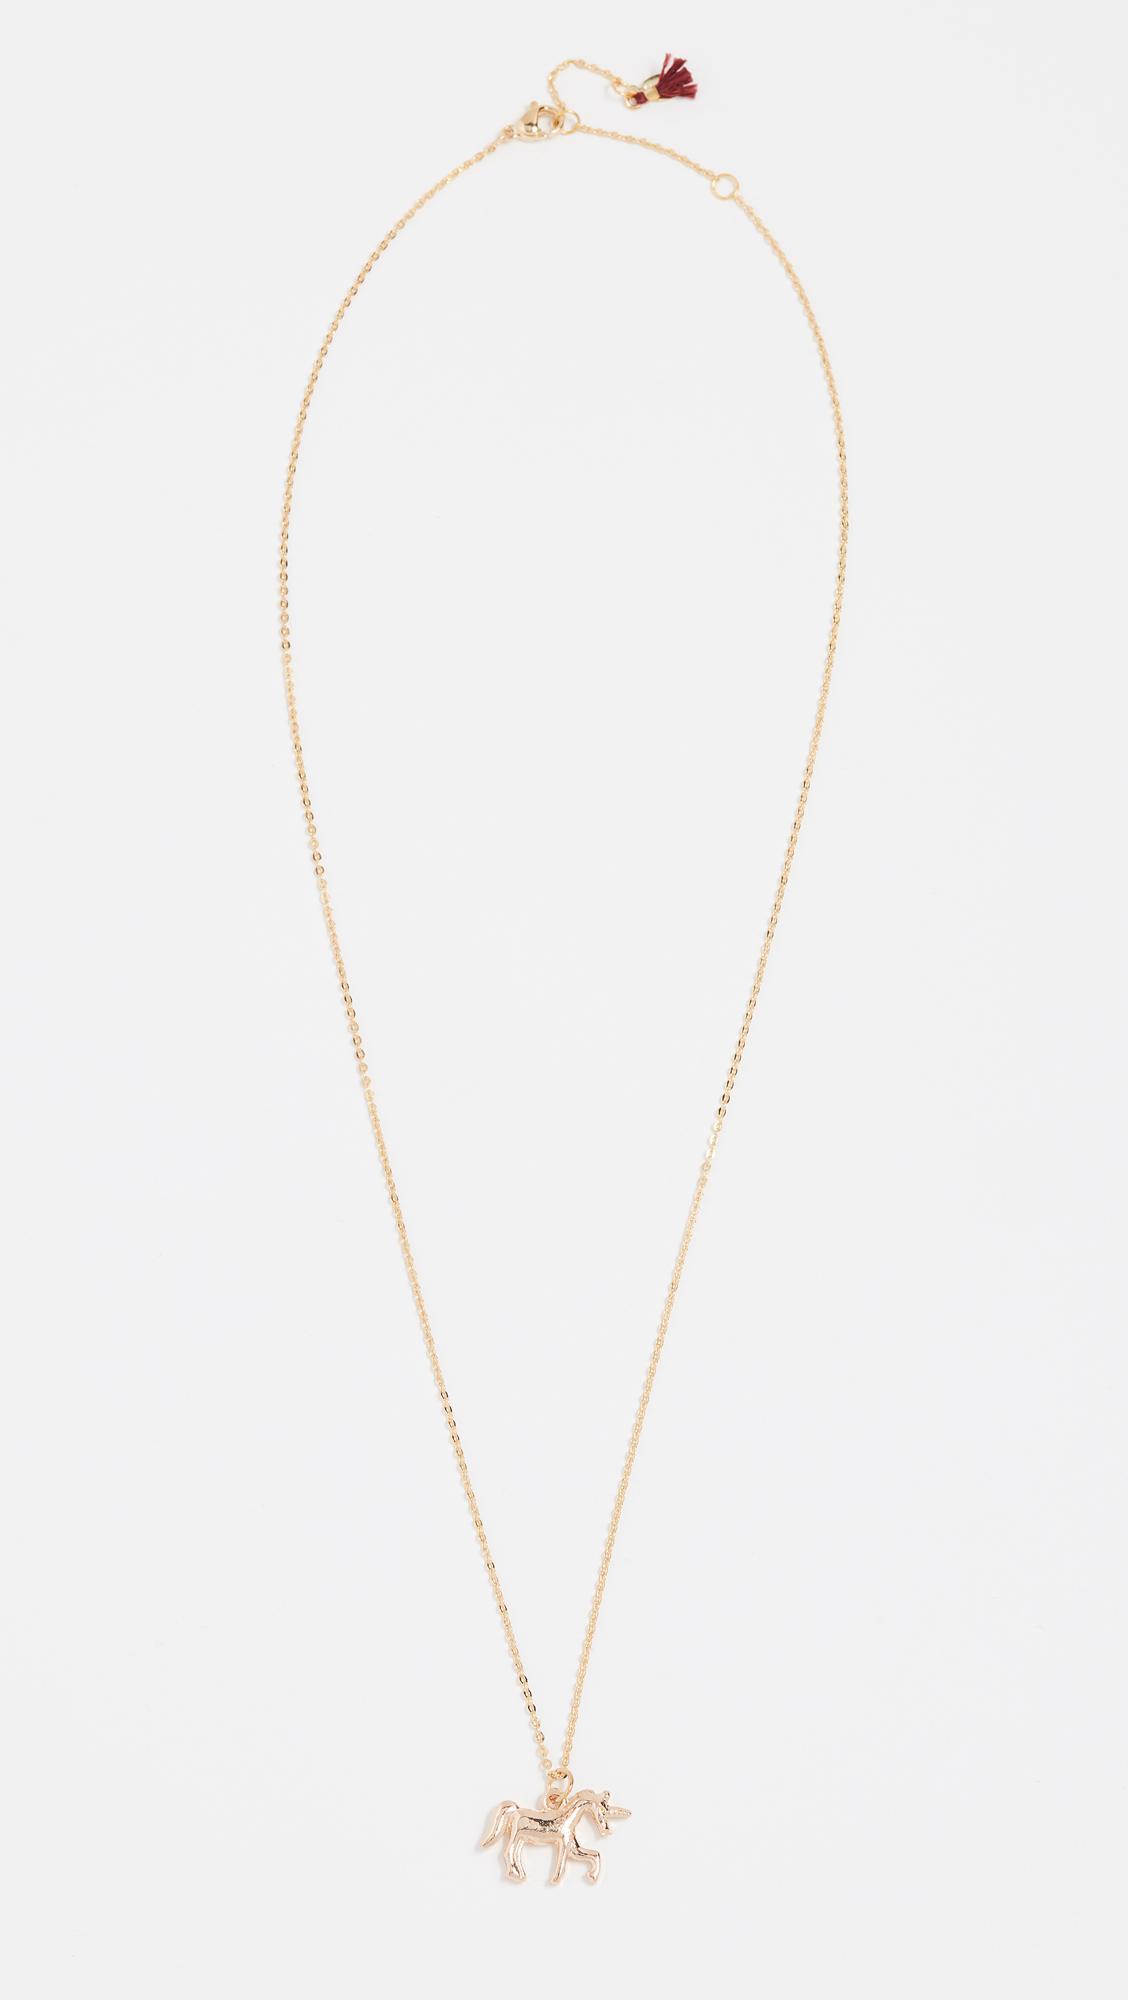 Shashi Unicorn Necklace in Yellow Gold (Metallic)